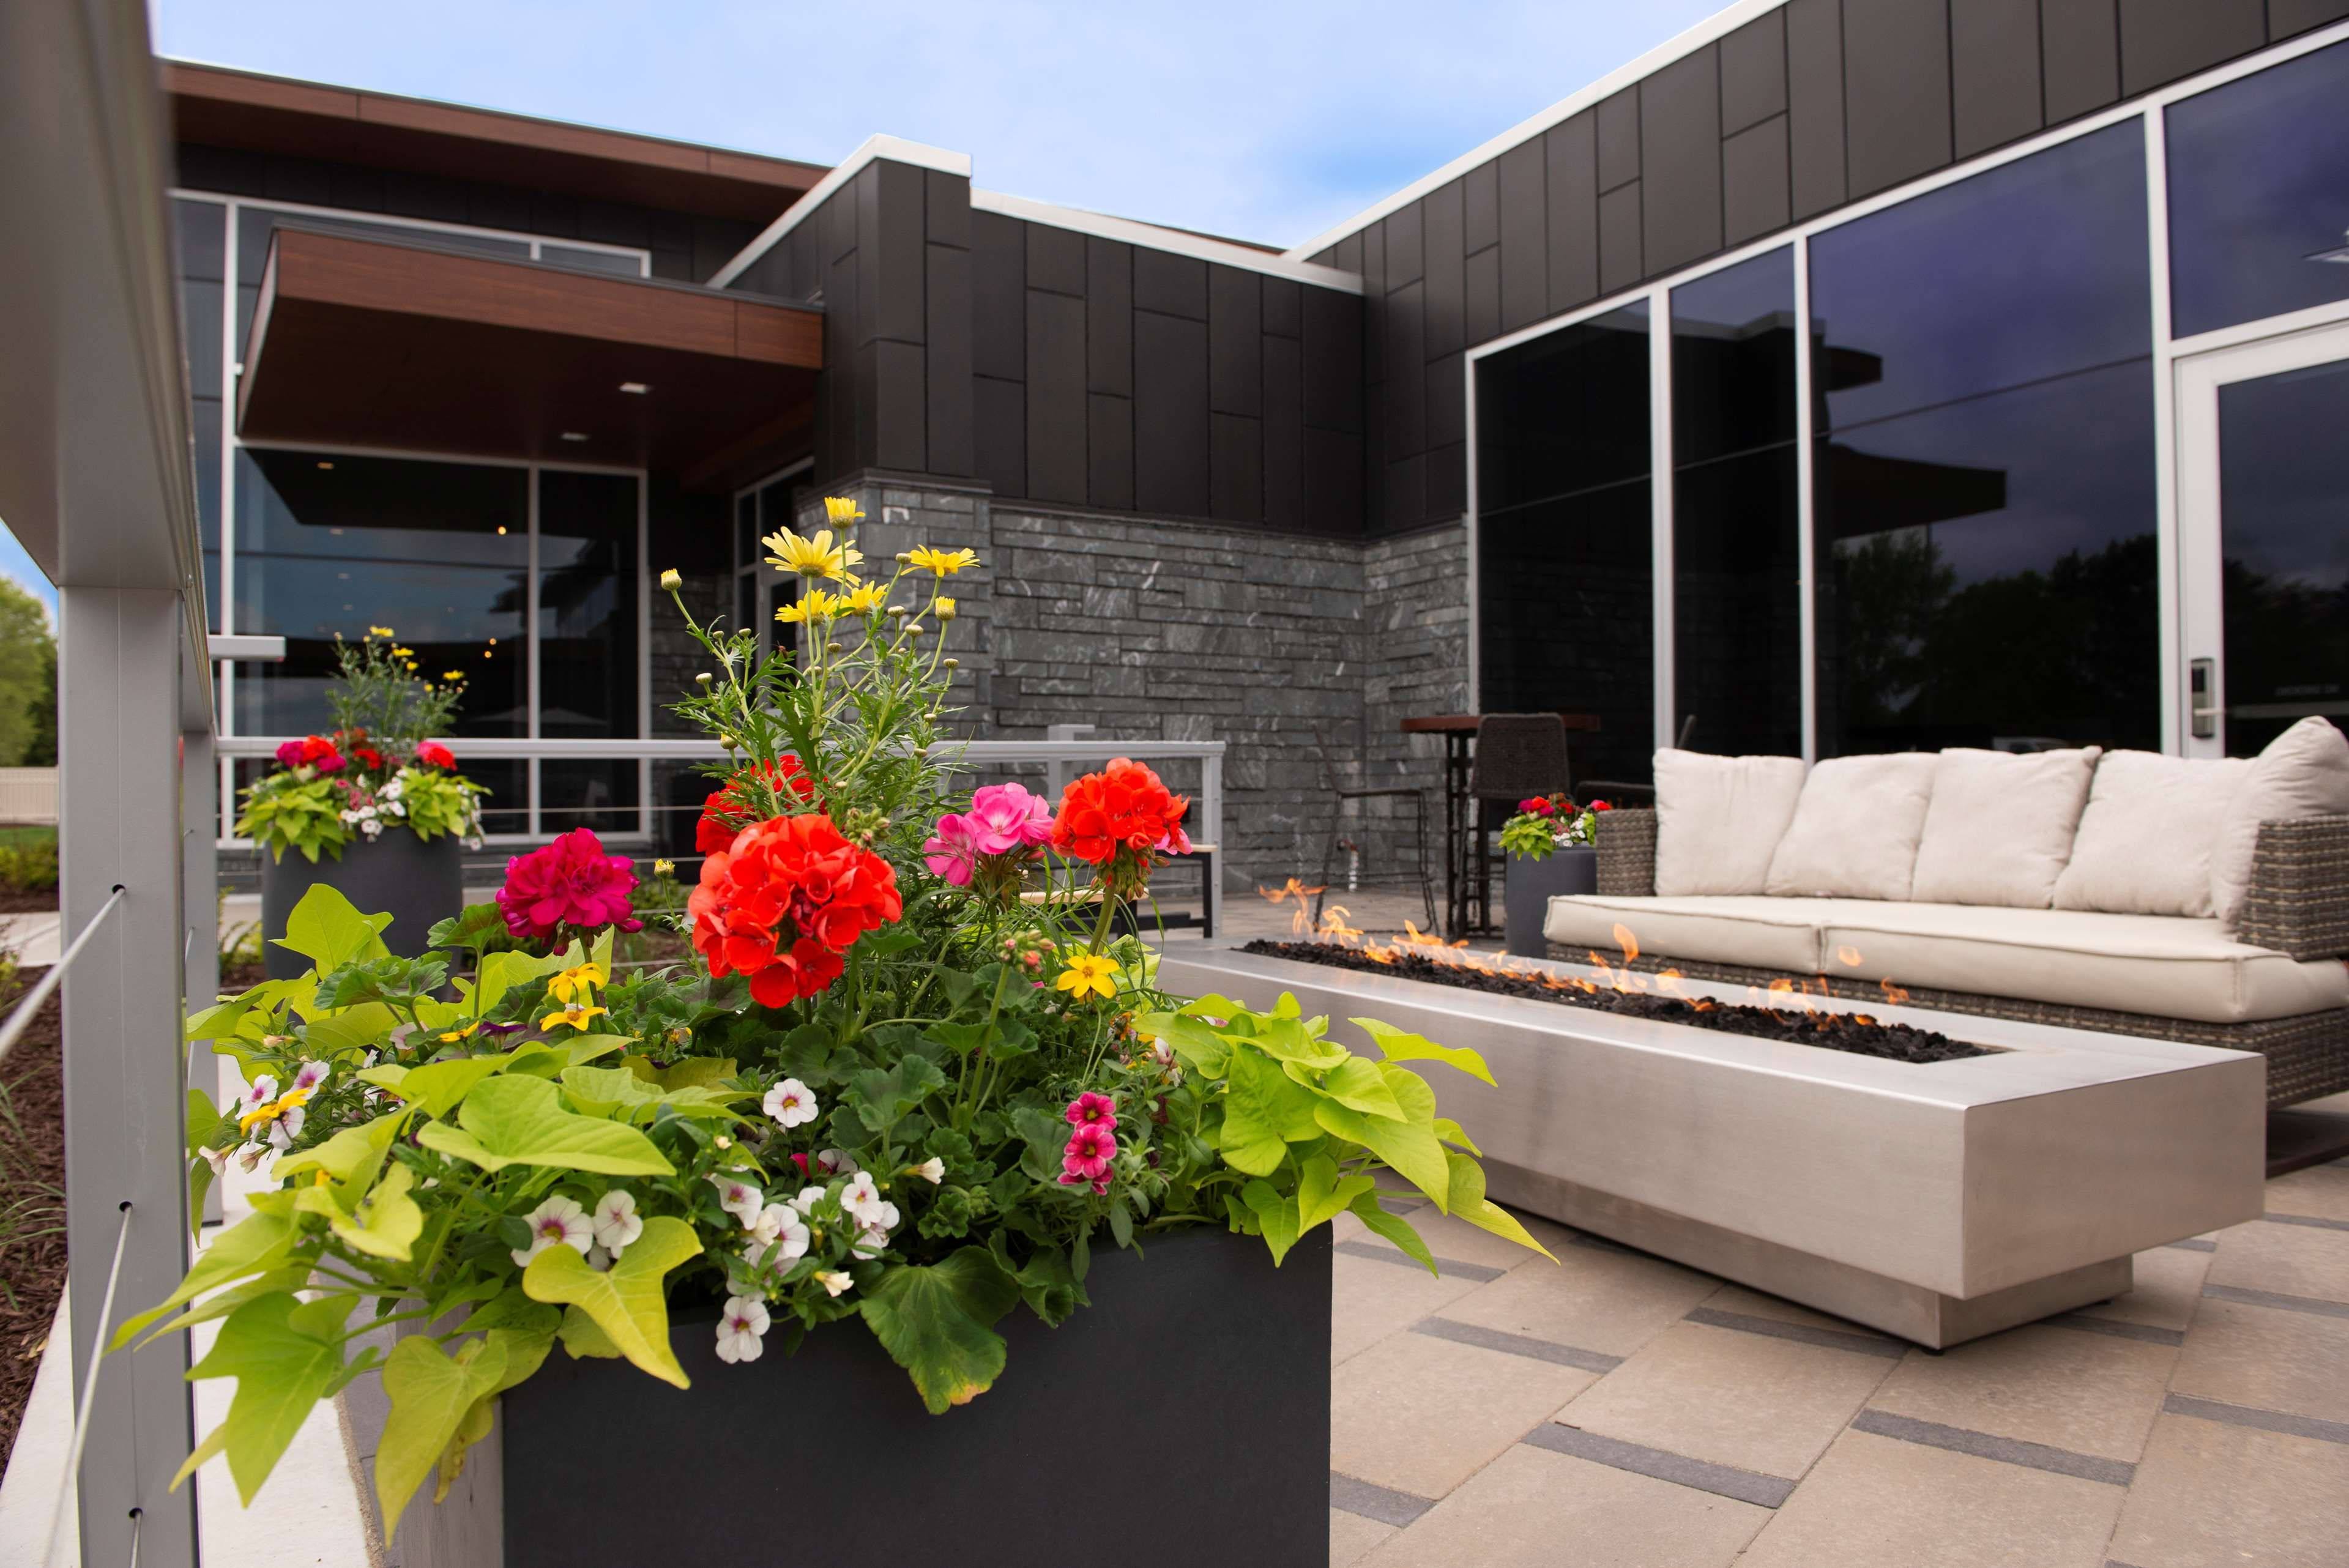 Hilton Garden Inn Wausau image 25